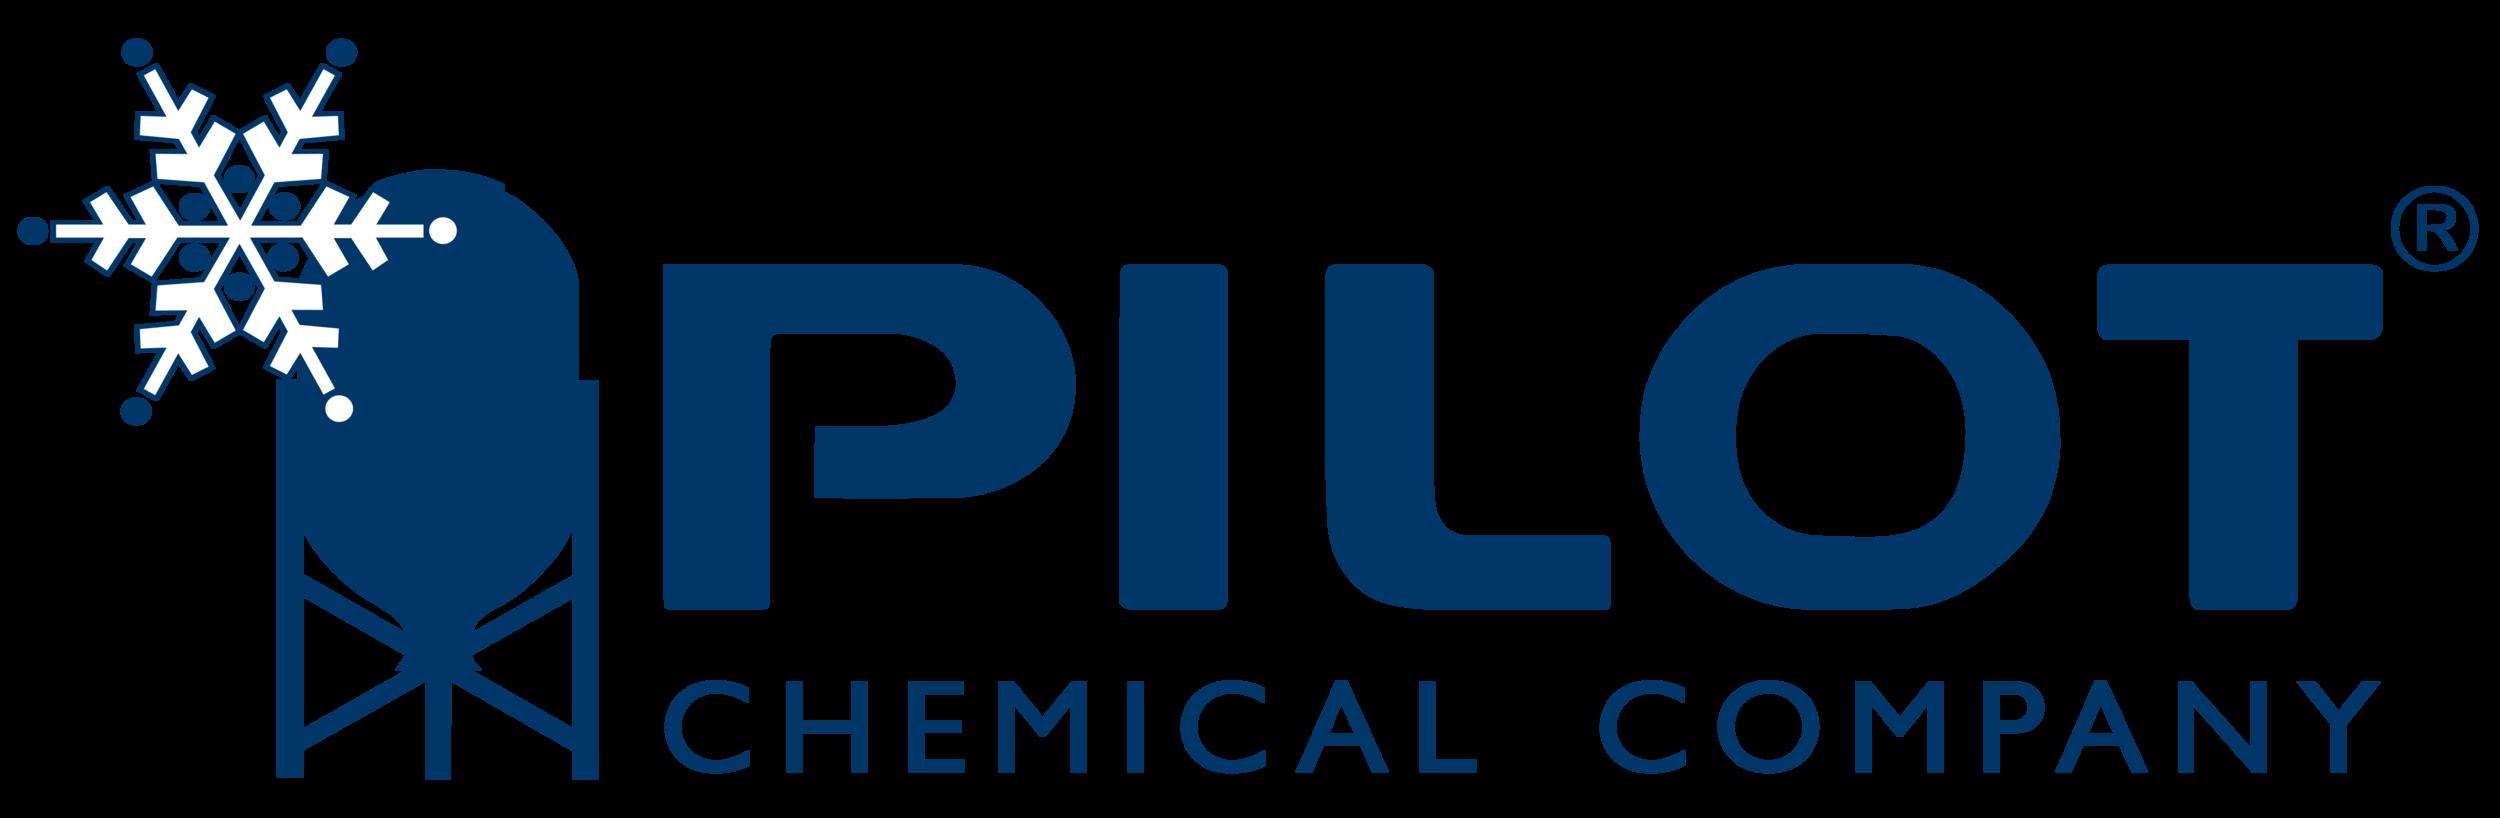 Pilot Chemical Logo.png